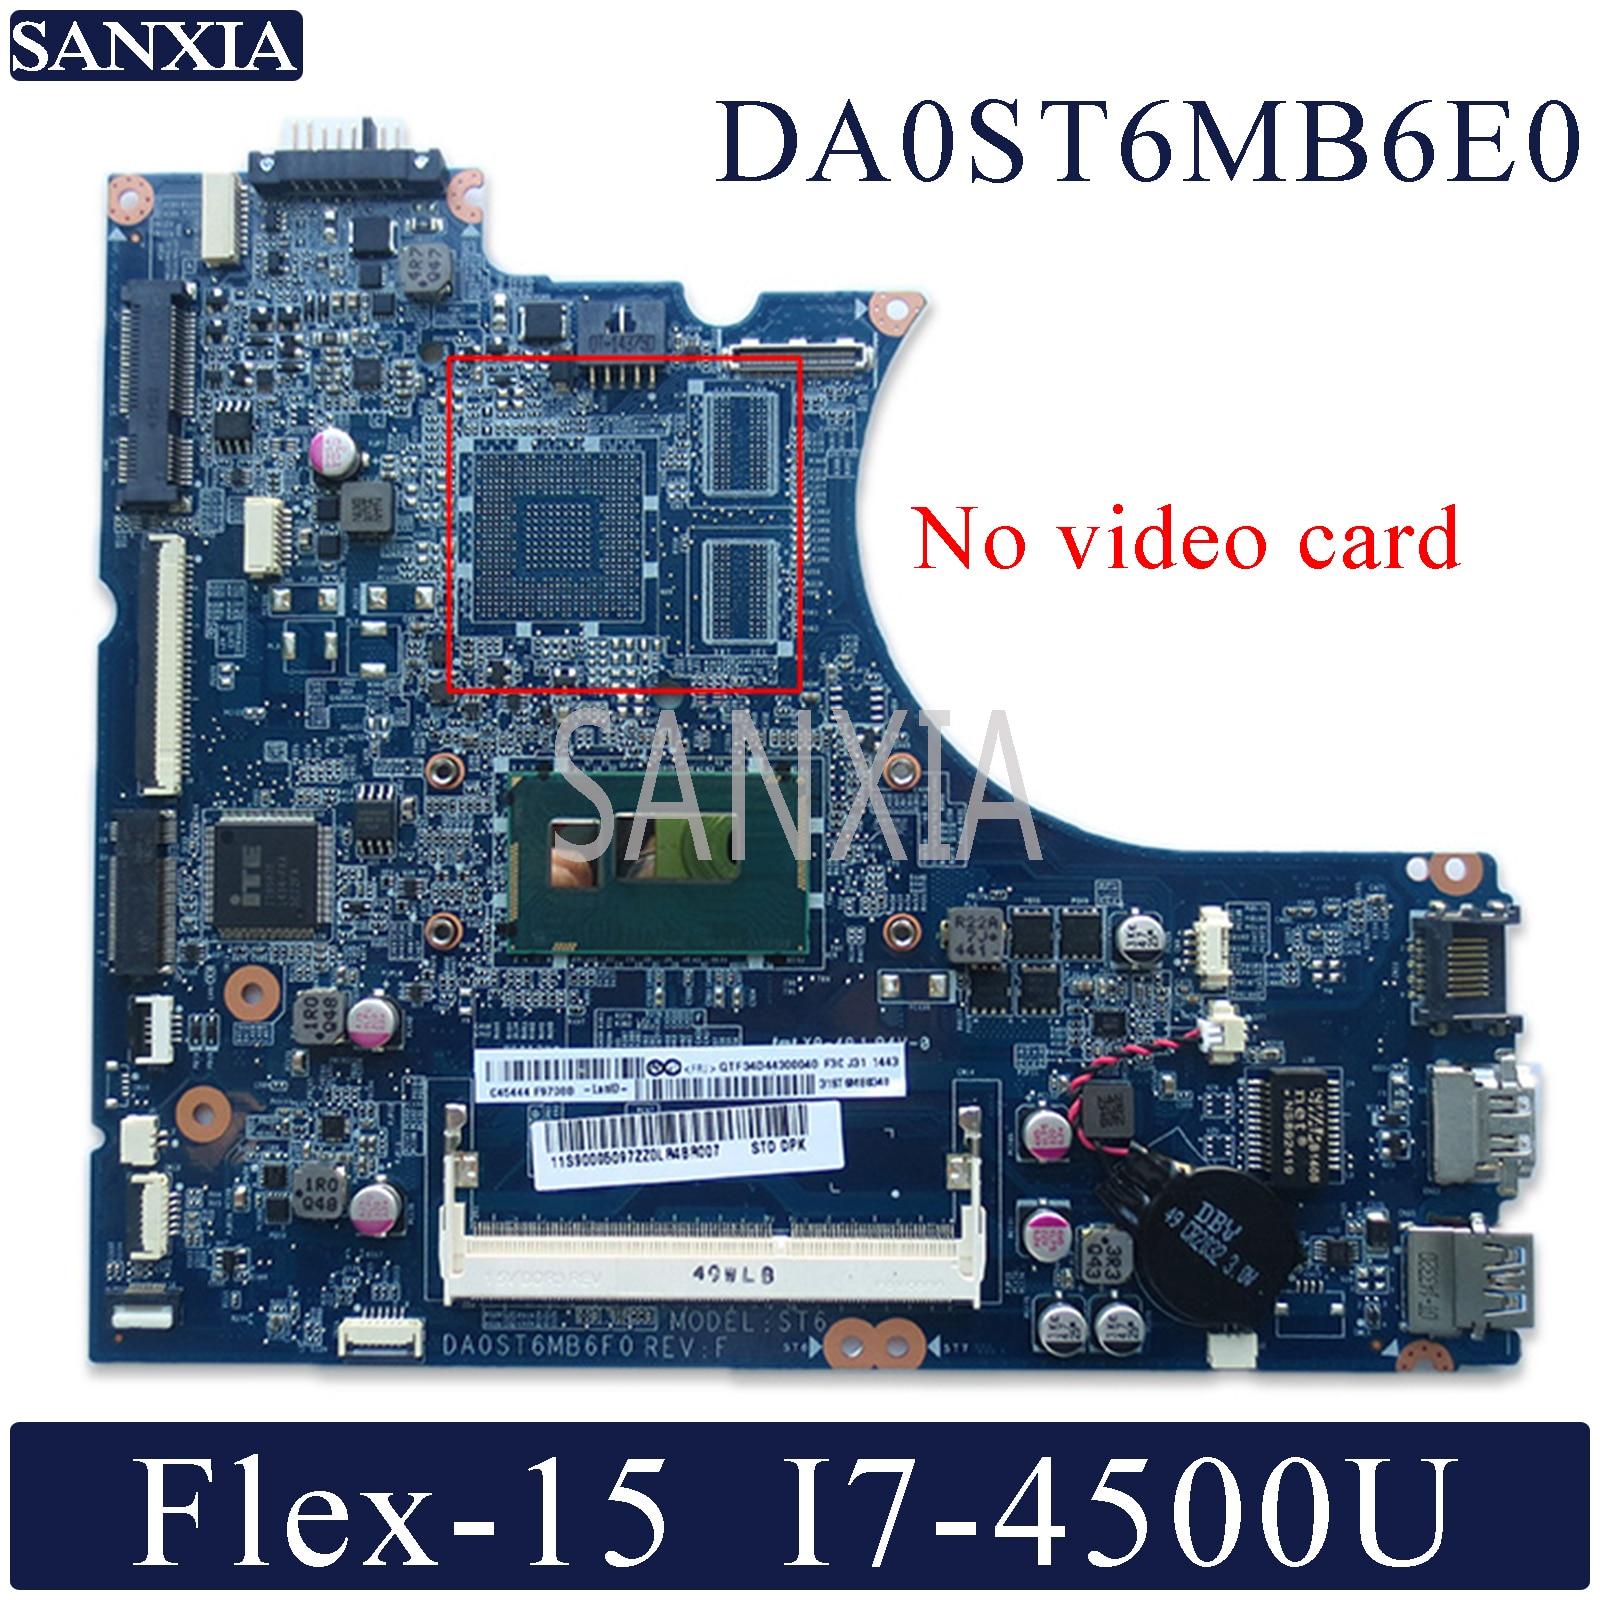 KEFU DA0ST6MB6E0 اللوحة المحمول لينوفو فليكس-14 اللوحة الأصلية I7-4500U